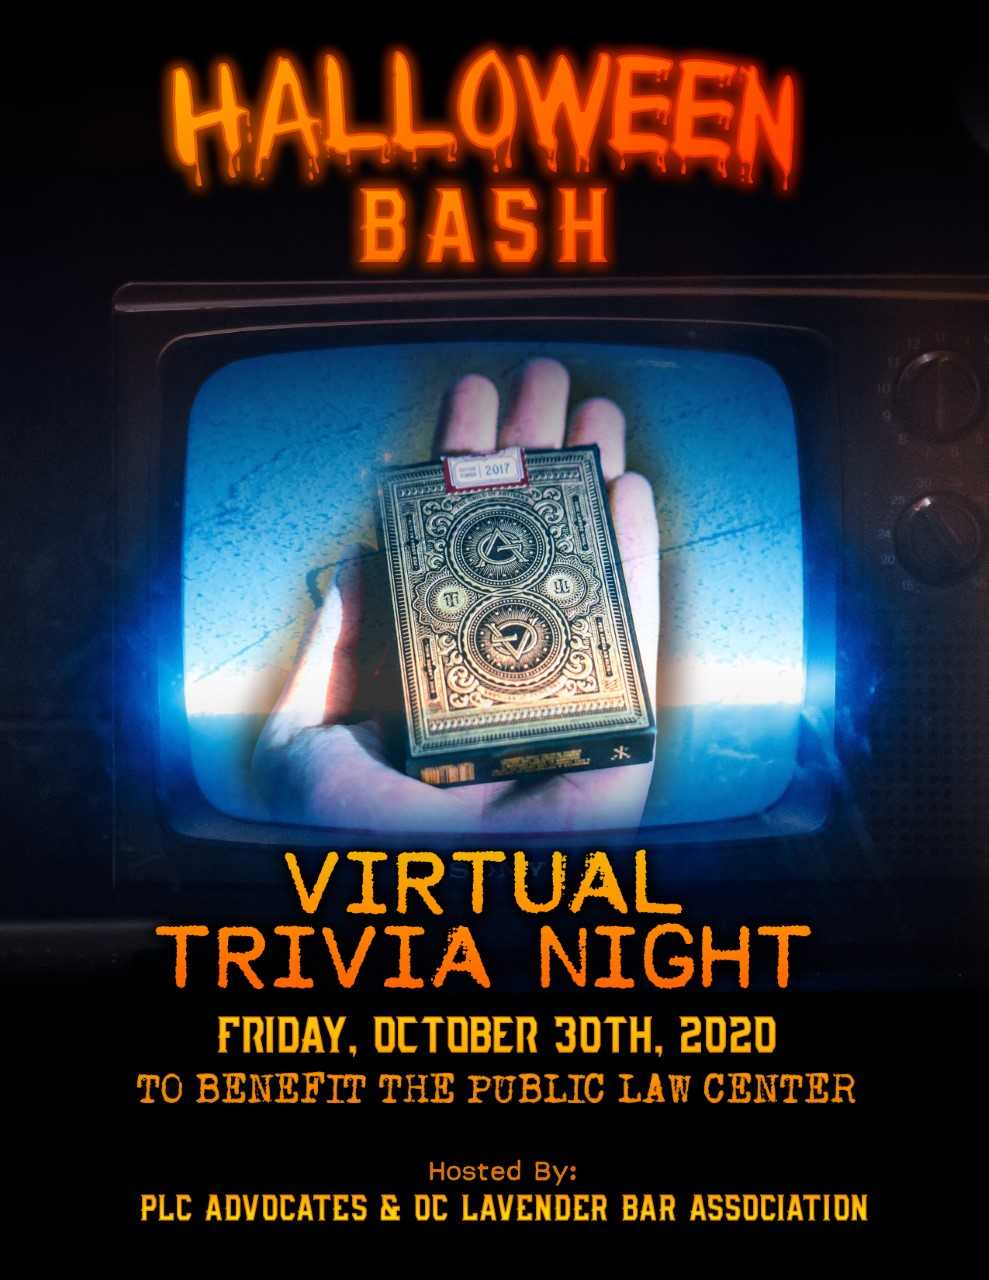 Halloween Bash Trivia Night